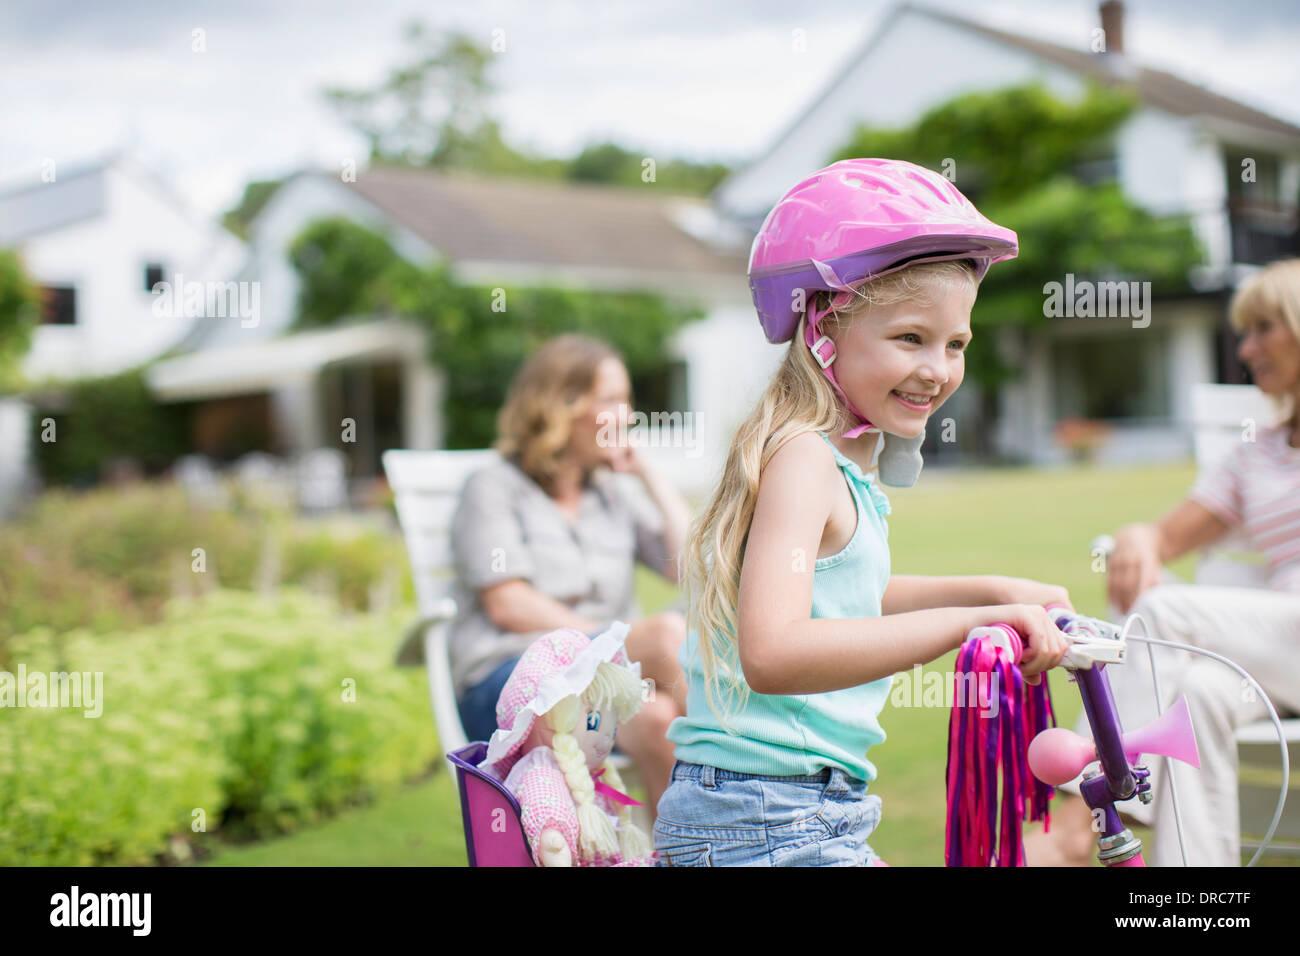 girl-riding-bicycle-in-backyard-DRC7TF.j